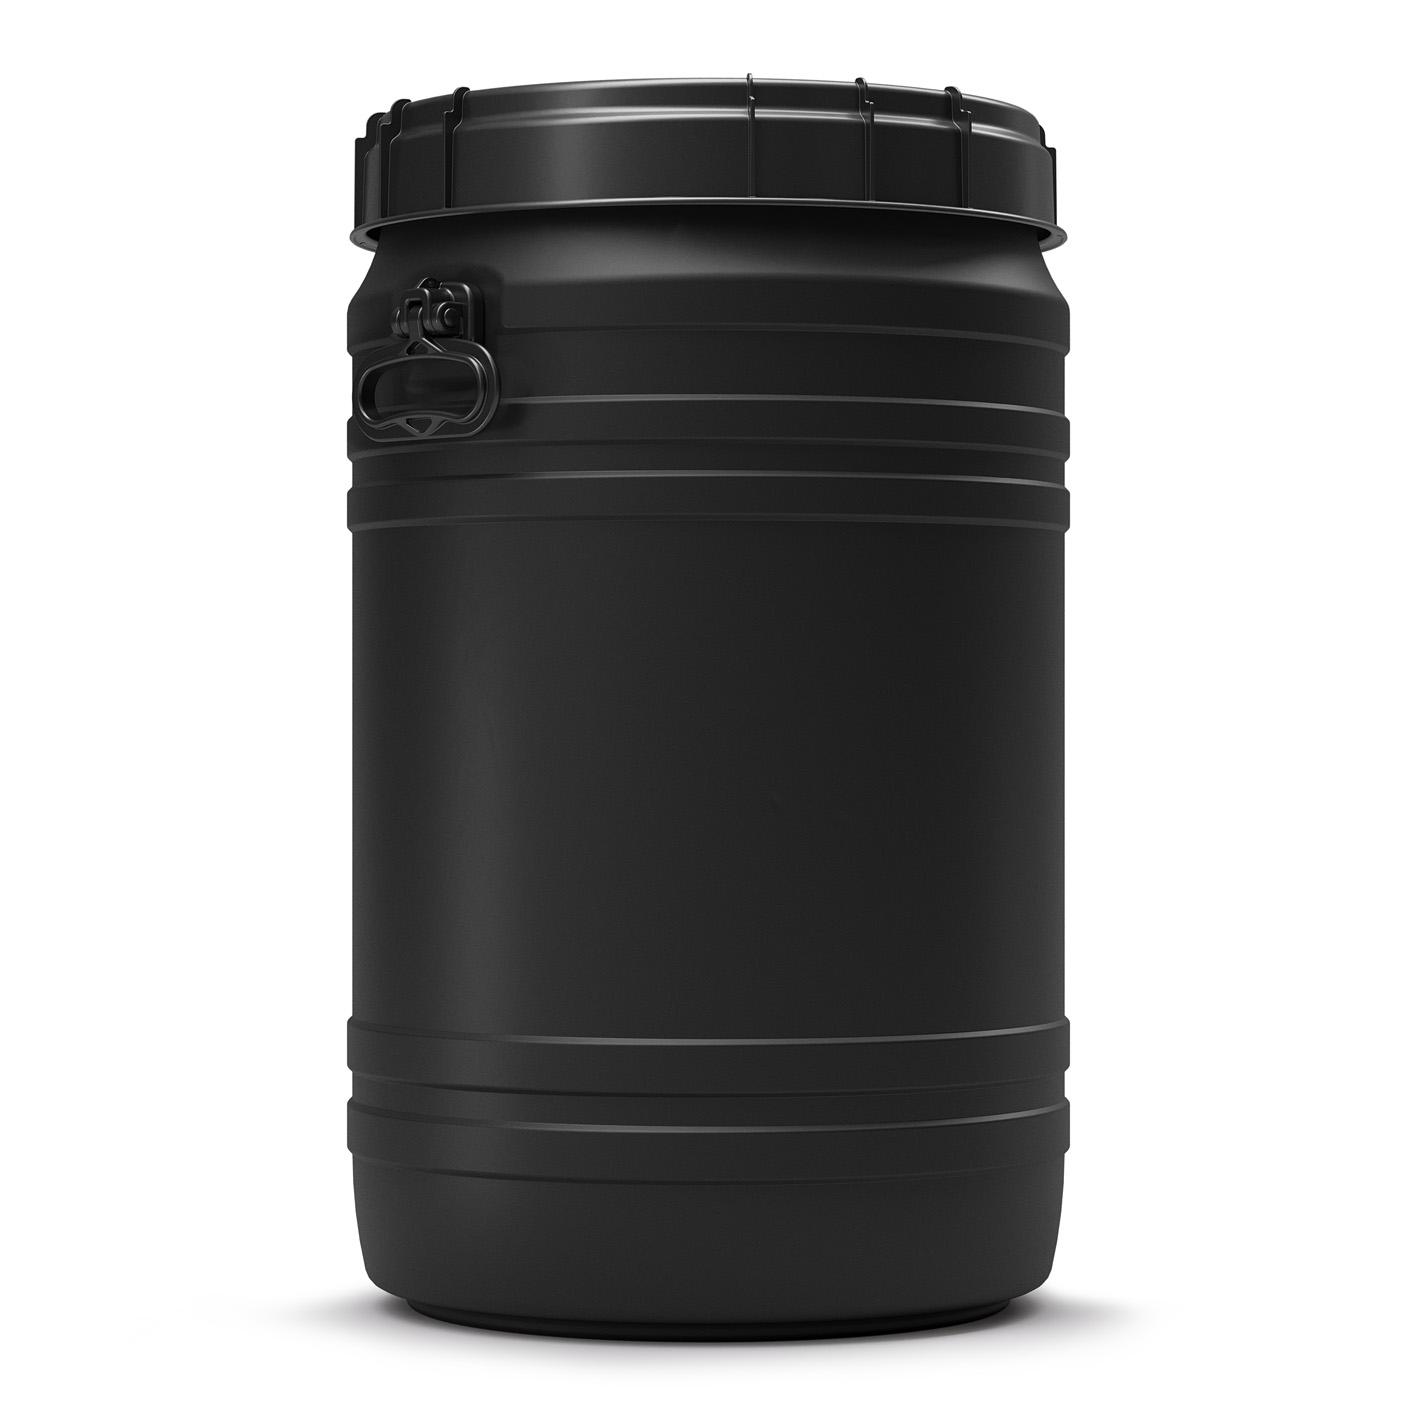 75 liter Conductive drum